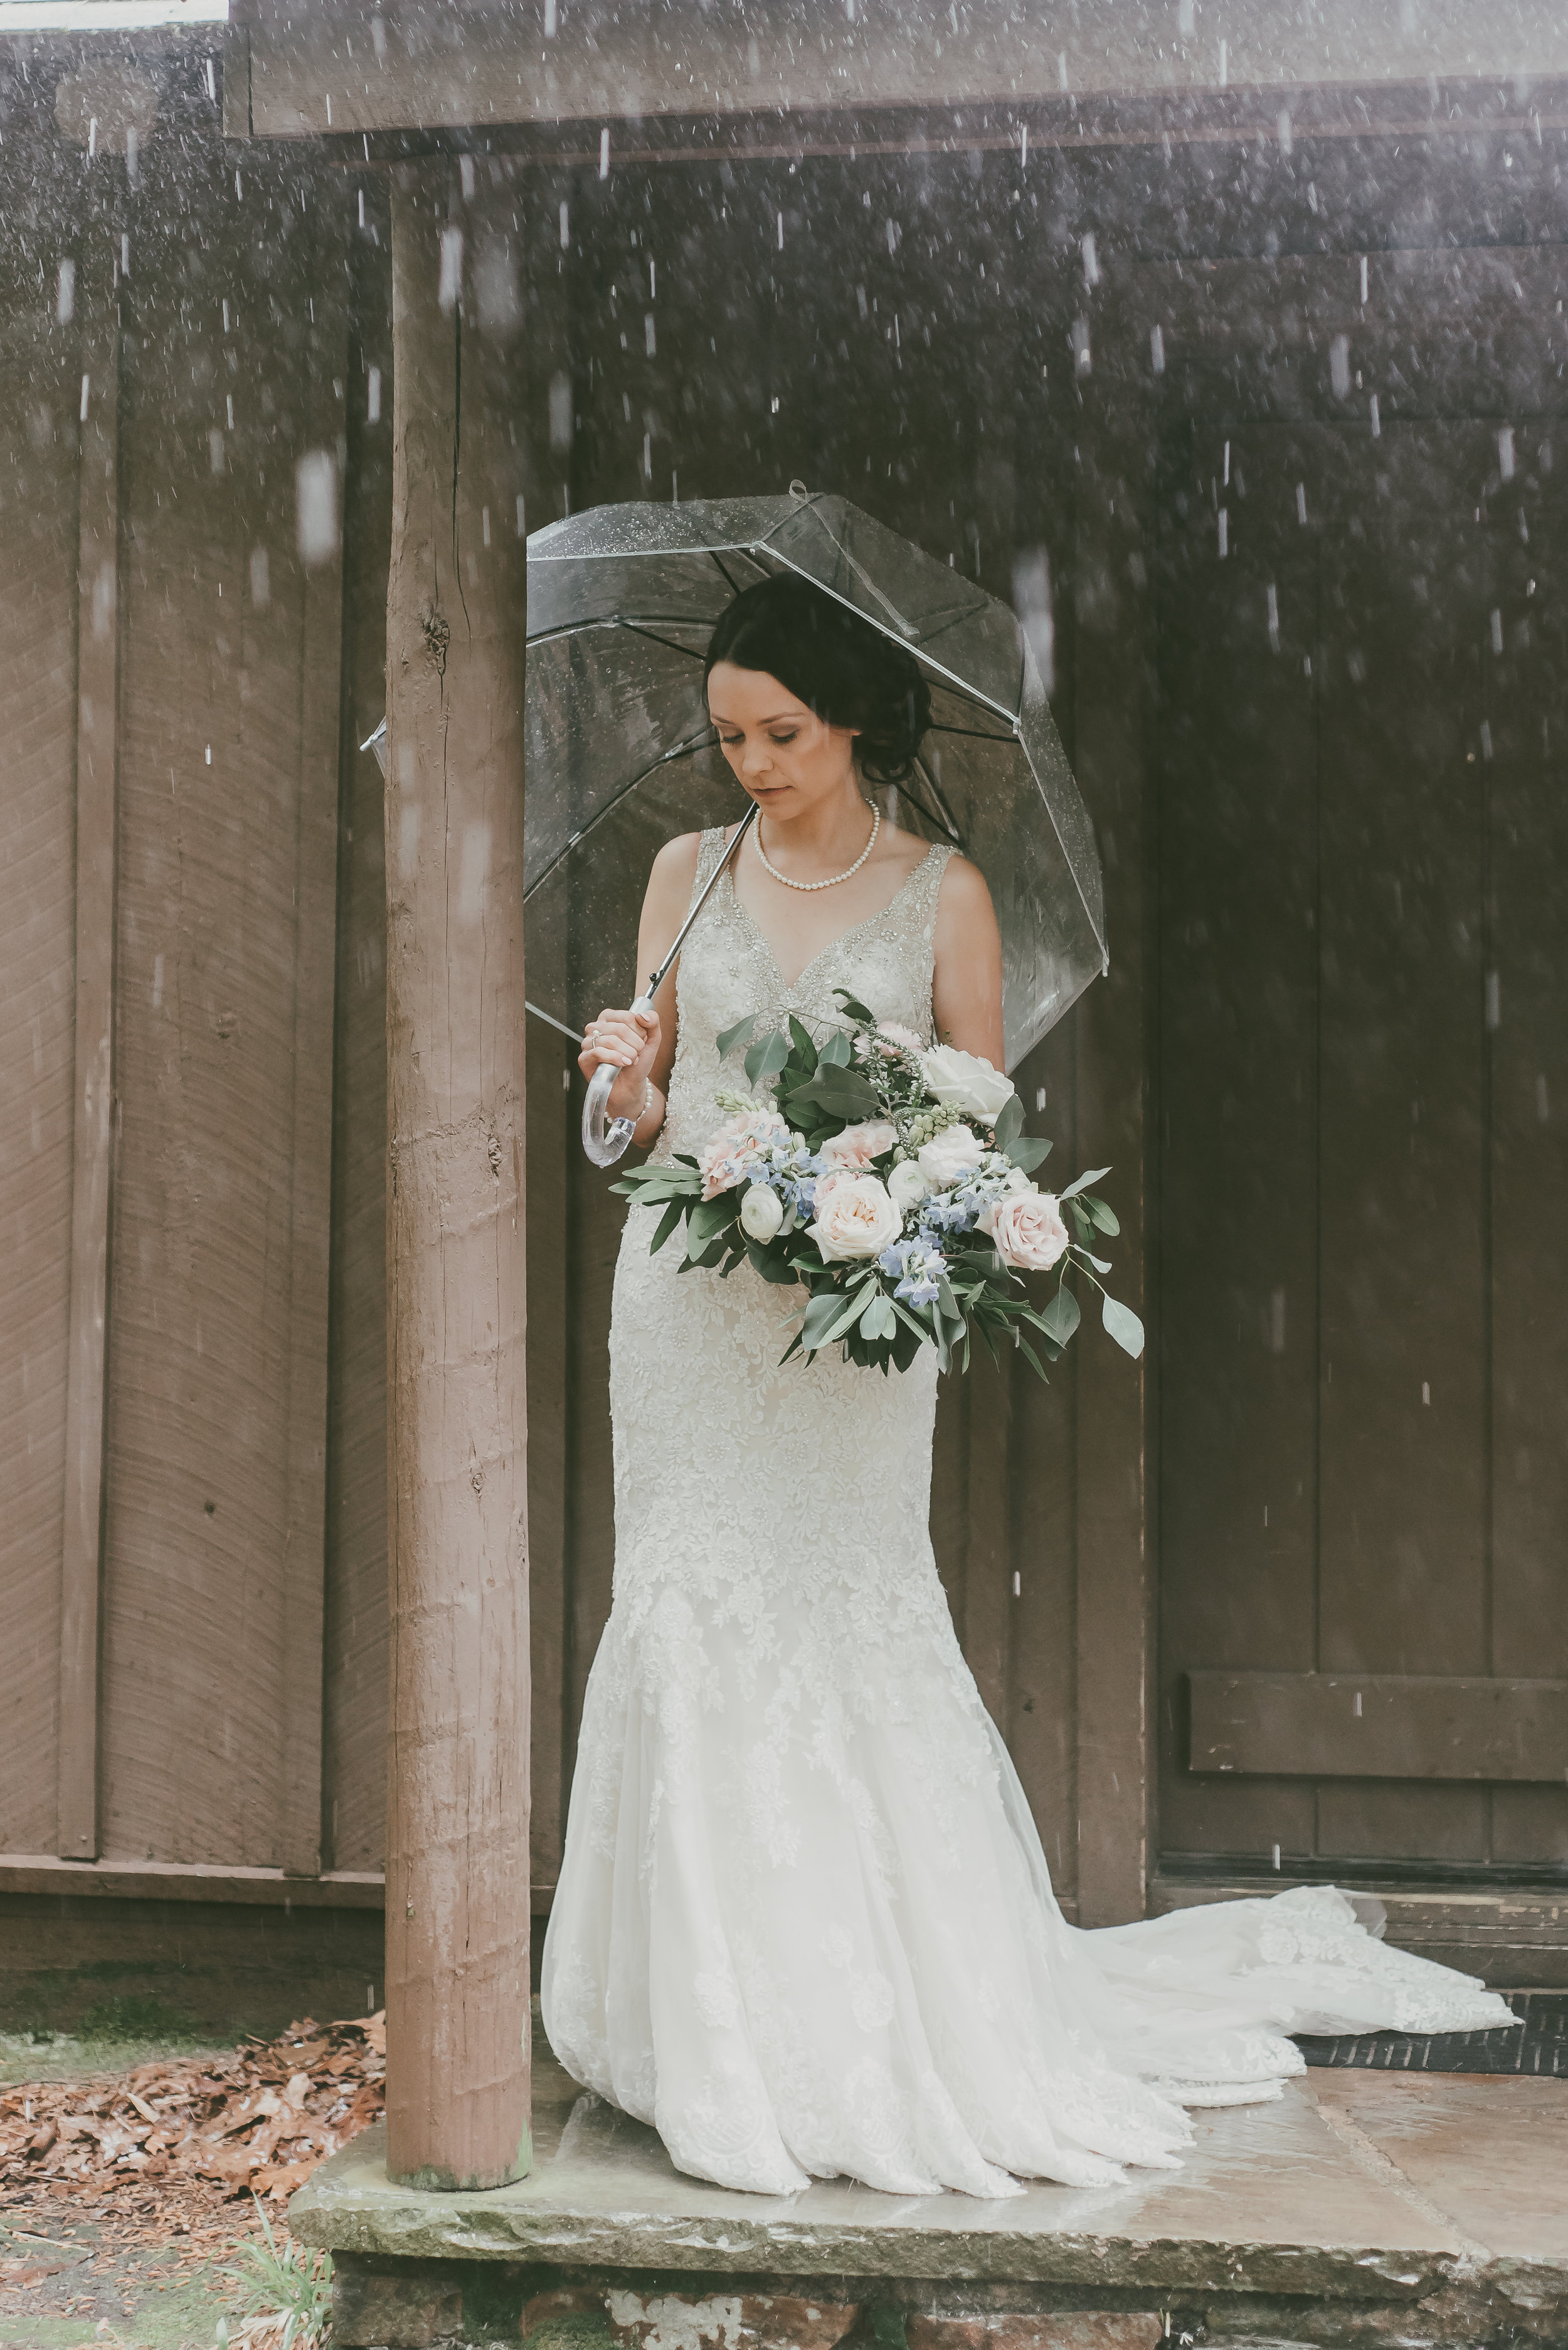 Misty Romance: Real Wedding